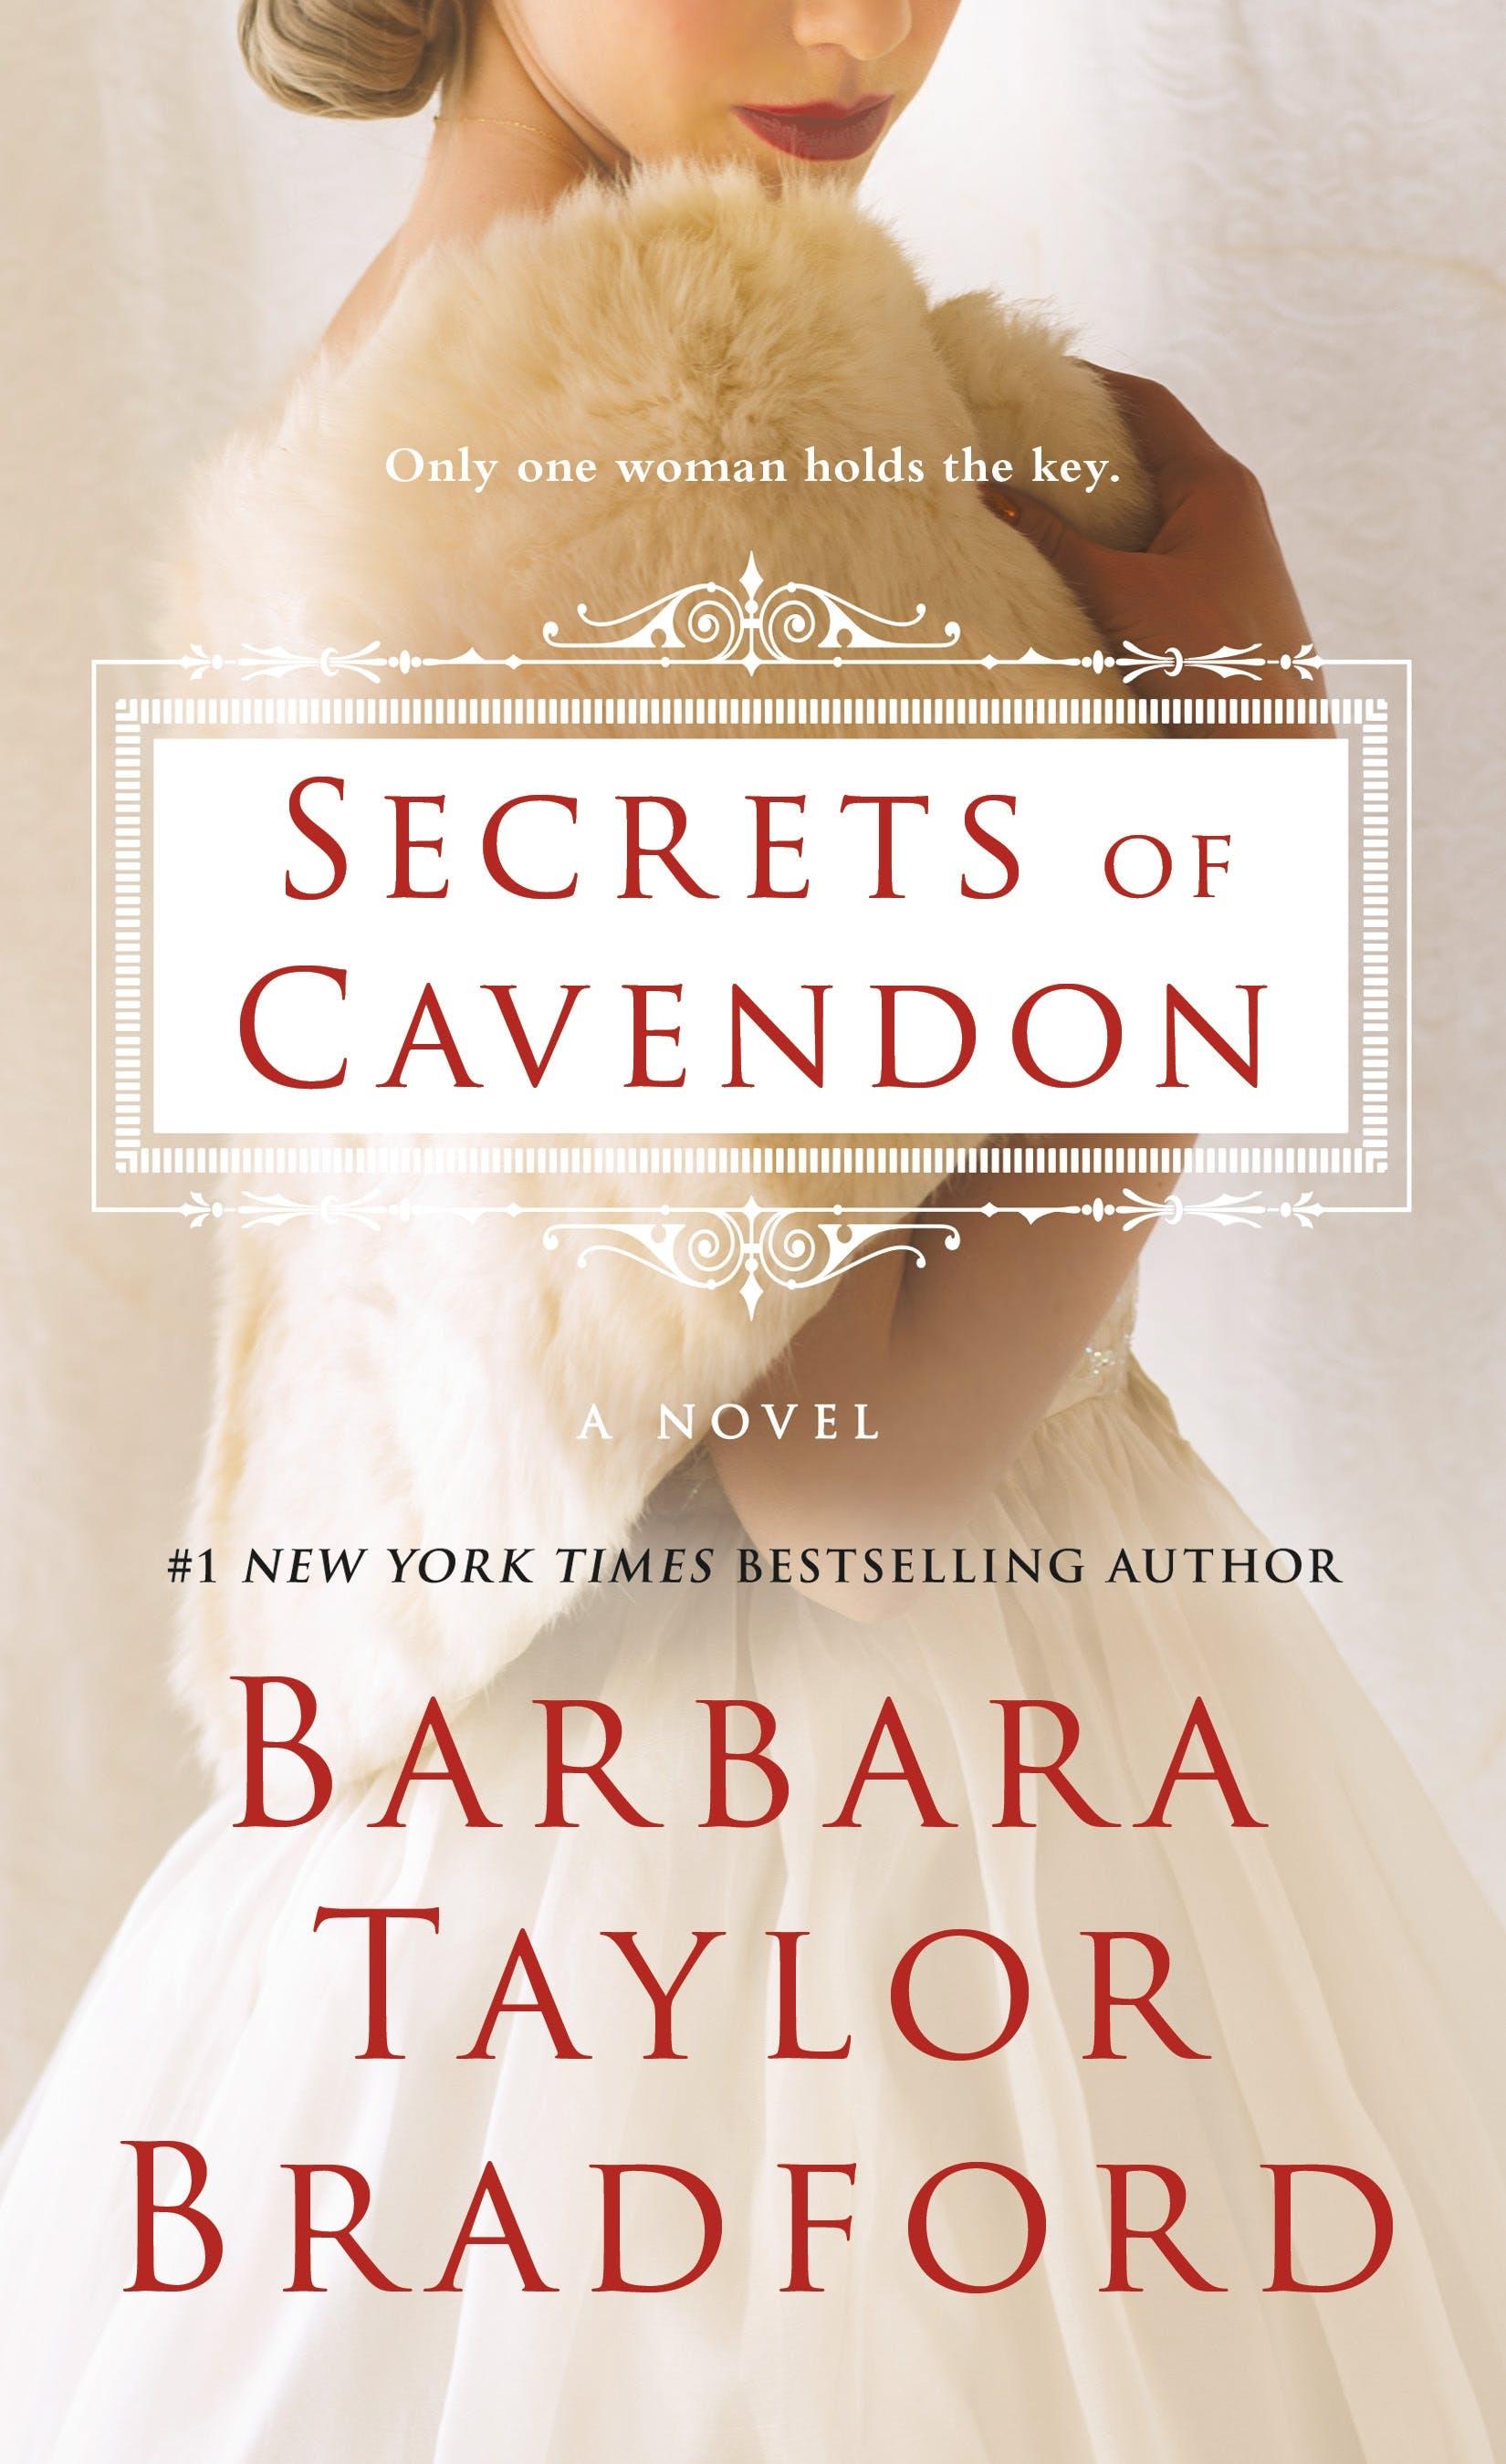 Image of Secrets of Cavendon